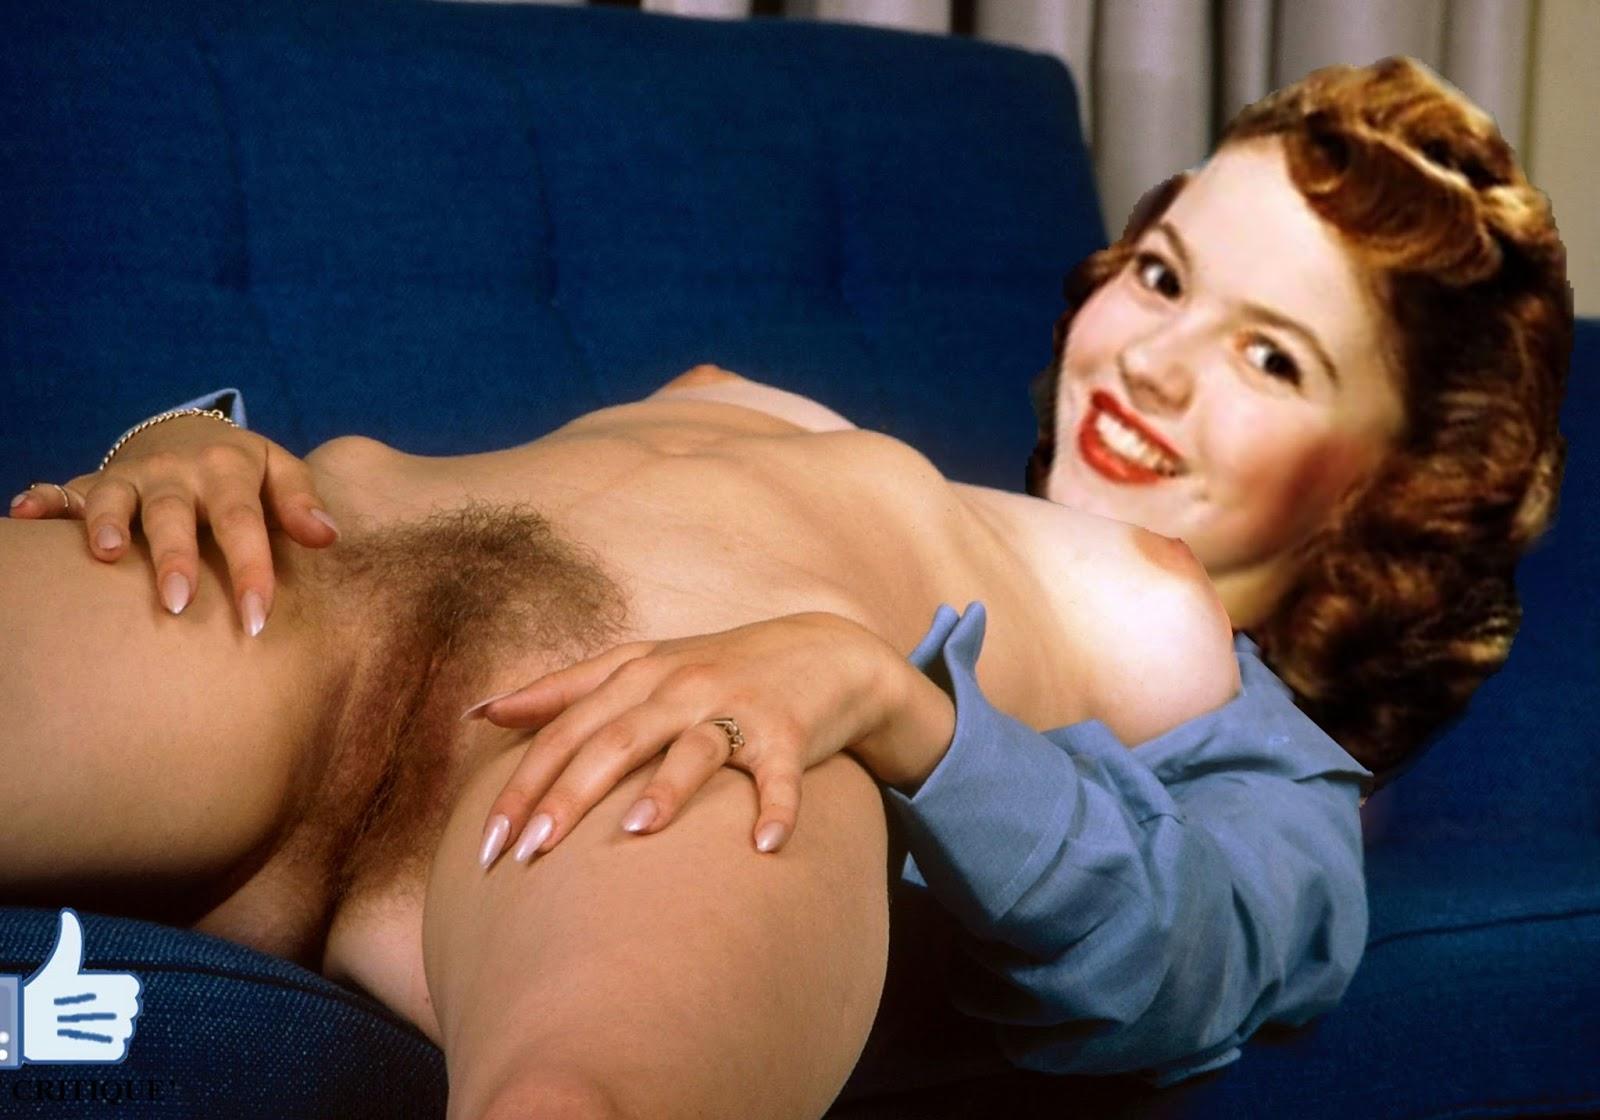 Shirley maclaine terms of endearment